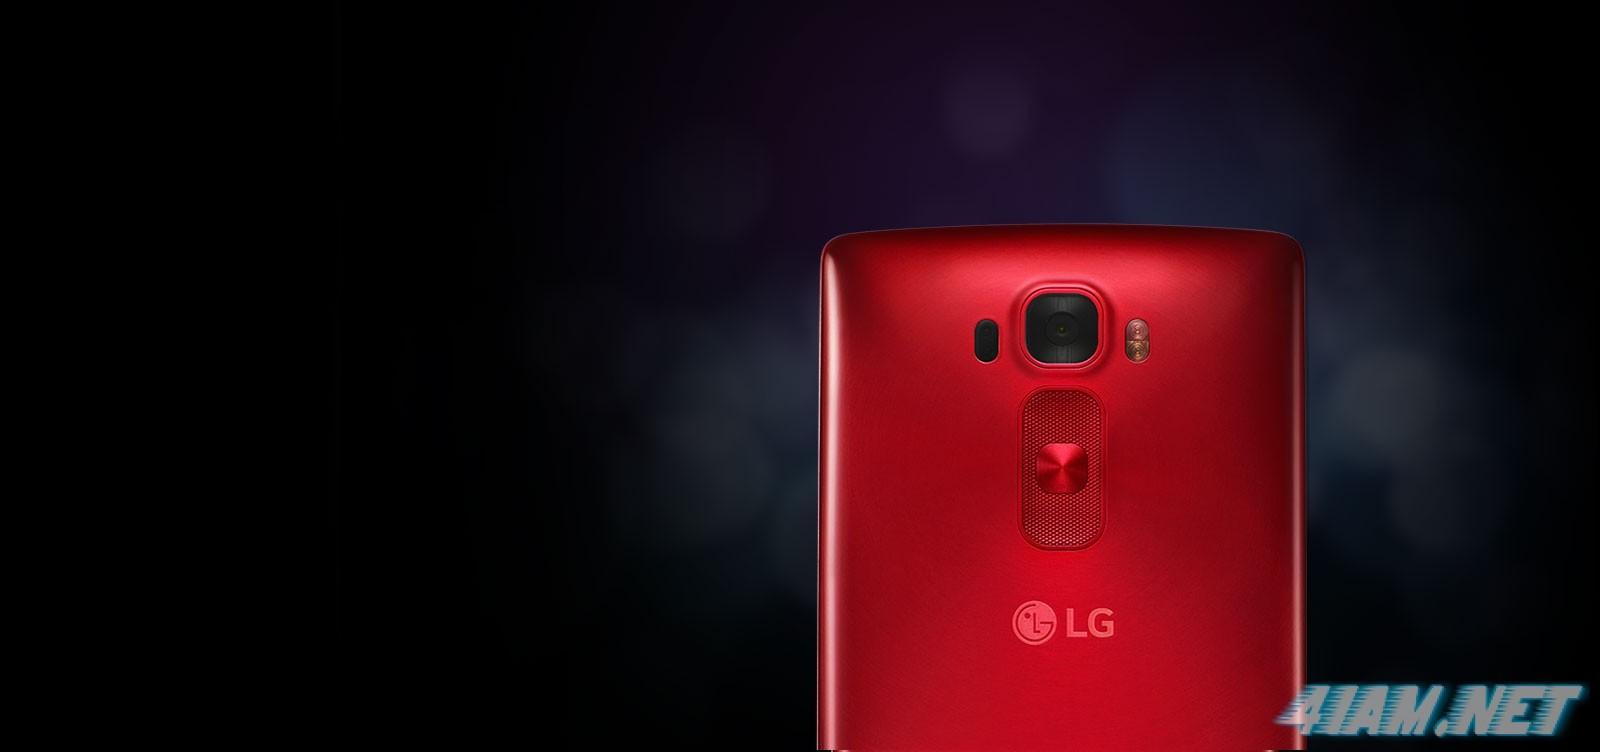 LG G Flex 2 - новый изогнутый флагман